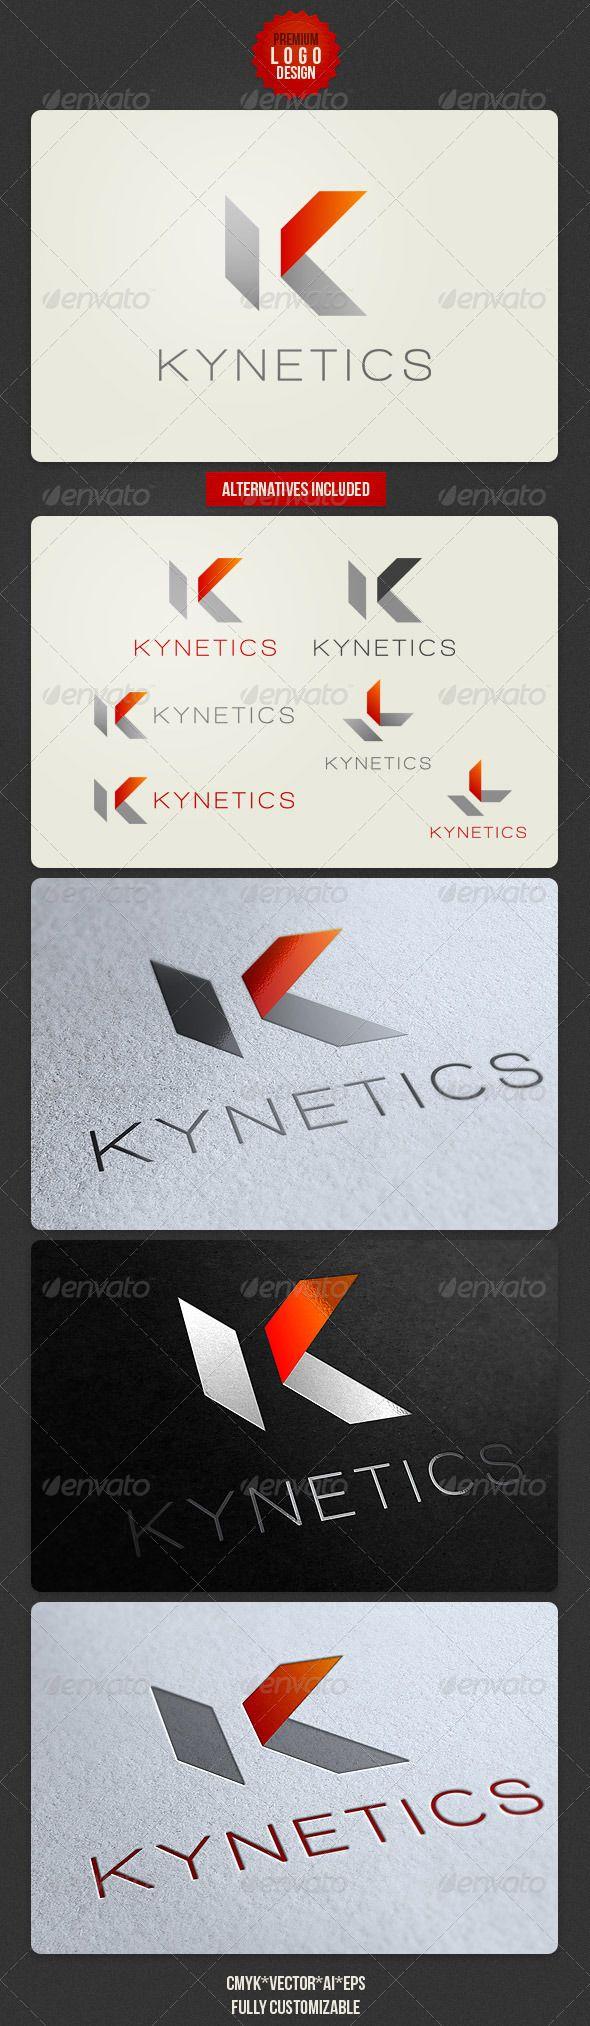 212 best ☆ Design // Logos ☆ images on Pinterest | Corporate ...